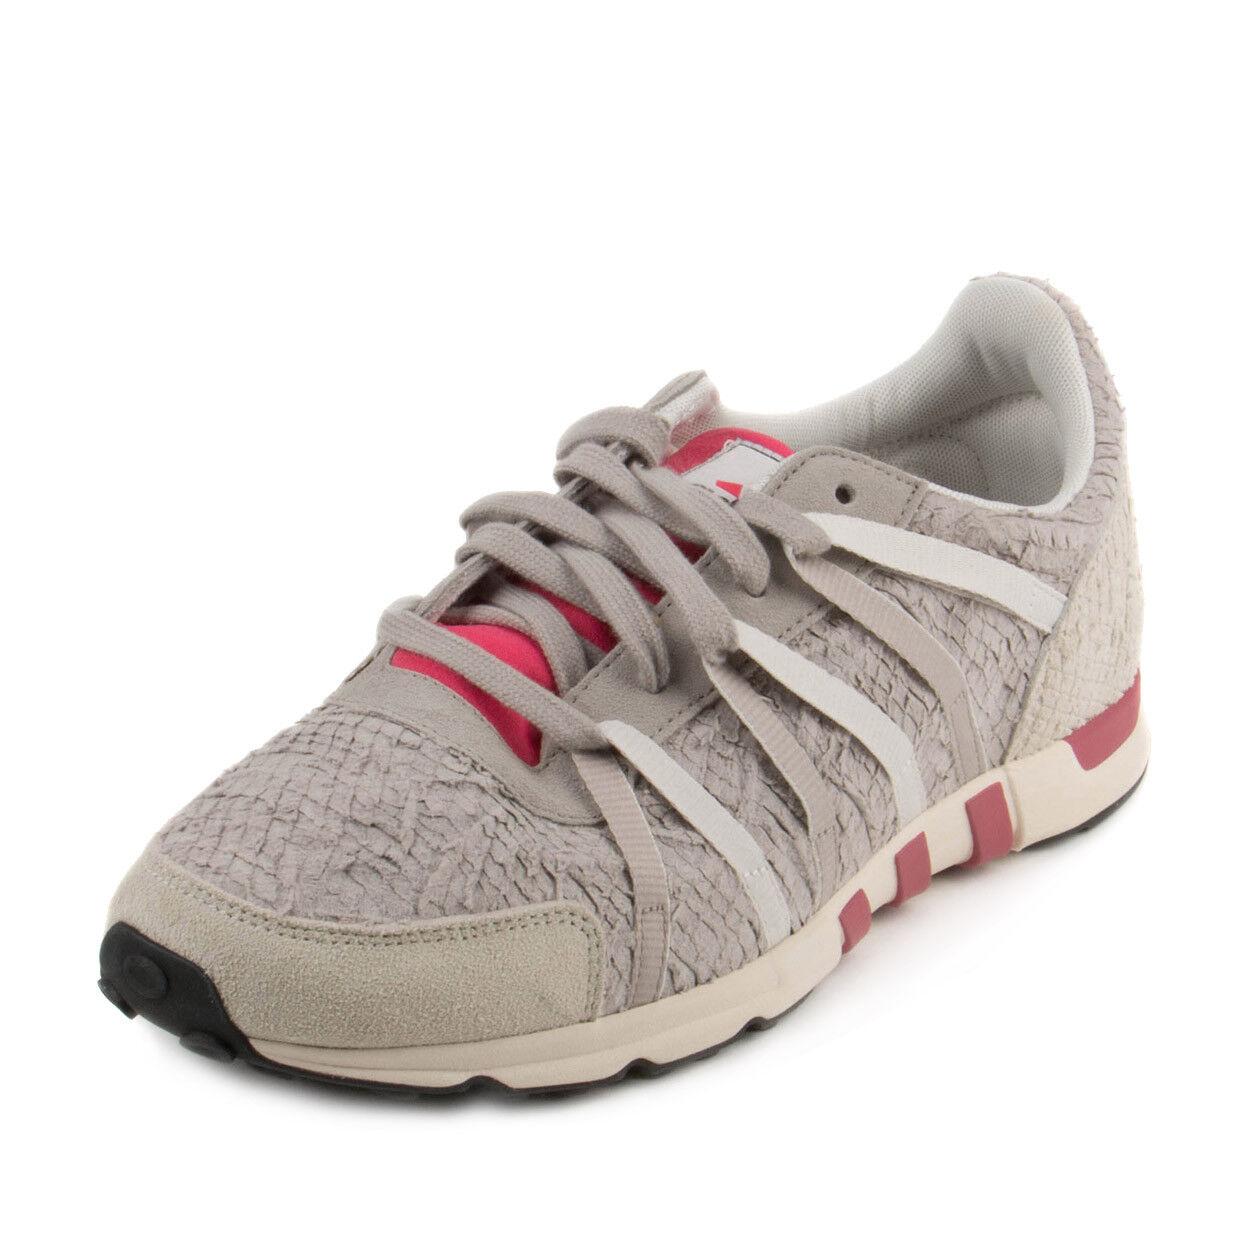 Adidas Mens Equipment Racing 93 Granite rot-Weiß S75425 Größe 11